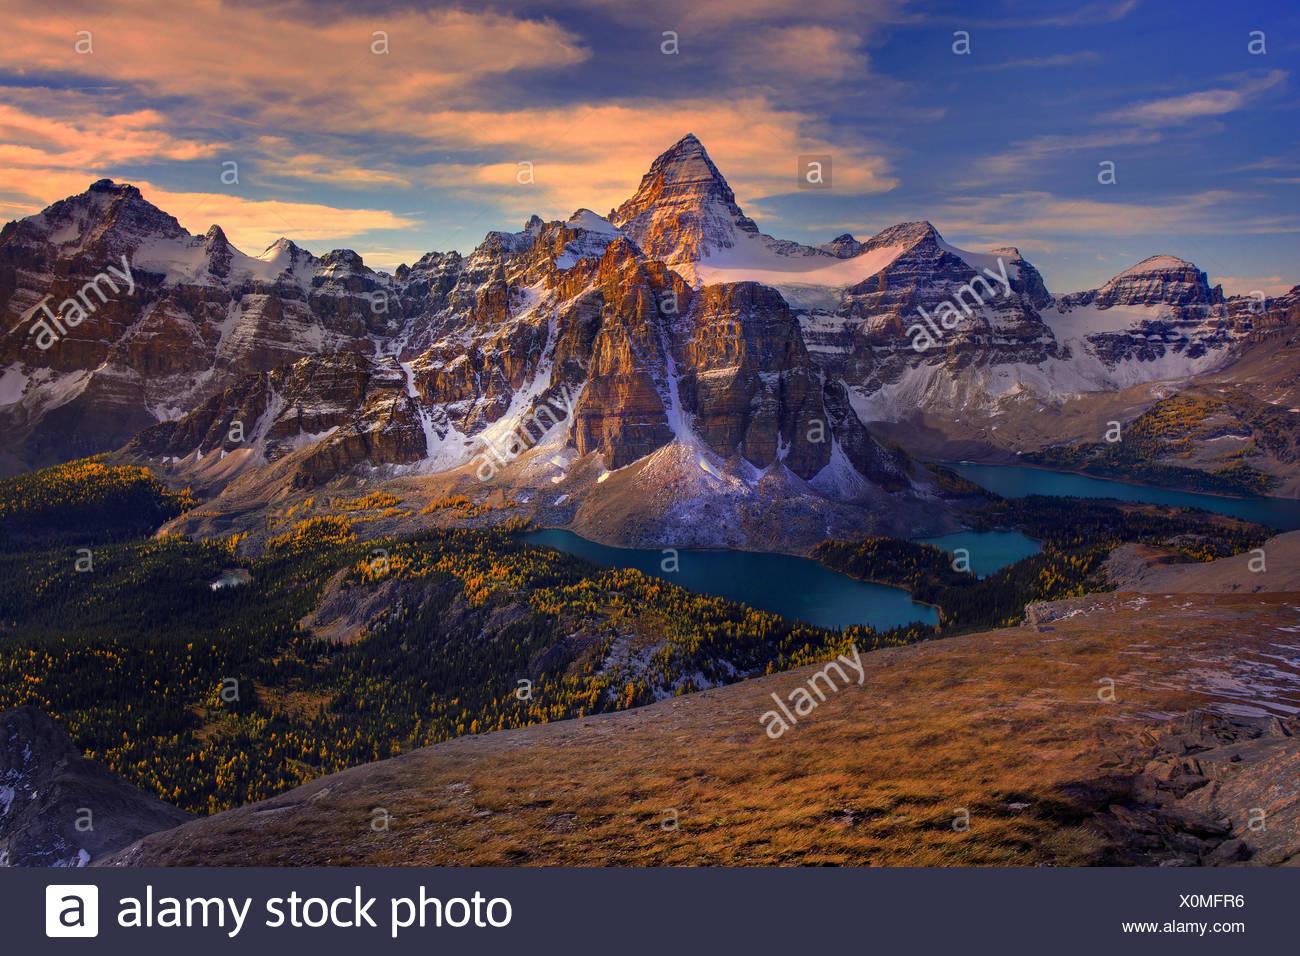 Kanada, Provinz, Natur, Landschaft, Rockies, kanadischen Rocky Mountains, Gebirge, See, Landschaft, Britisch-Kolumbien, Mount Assiniboine, L Stockbild